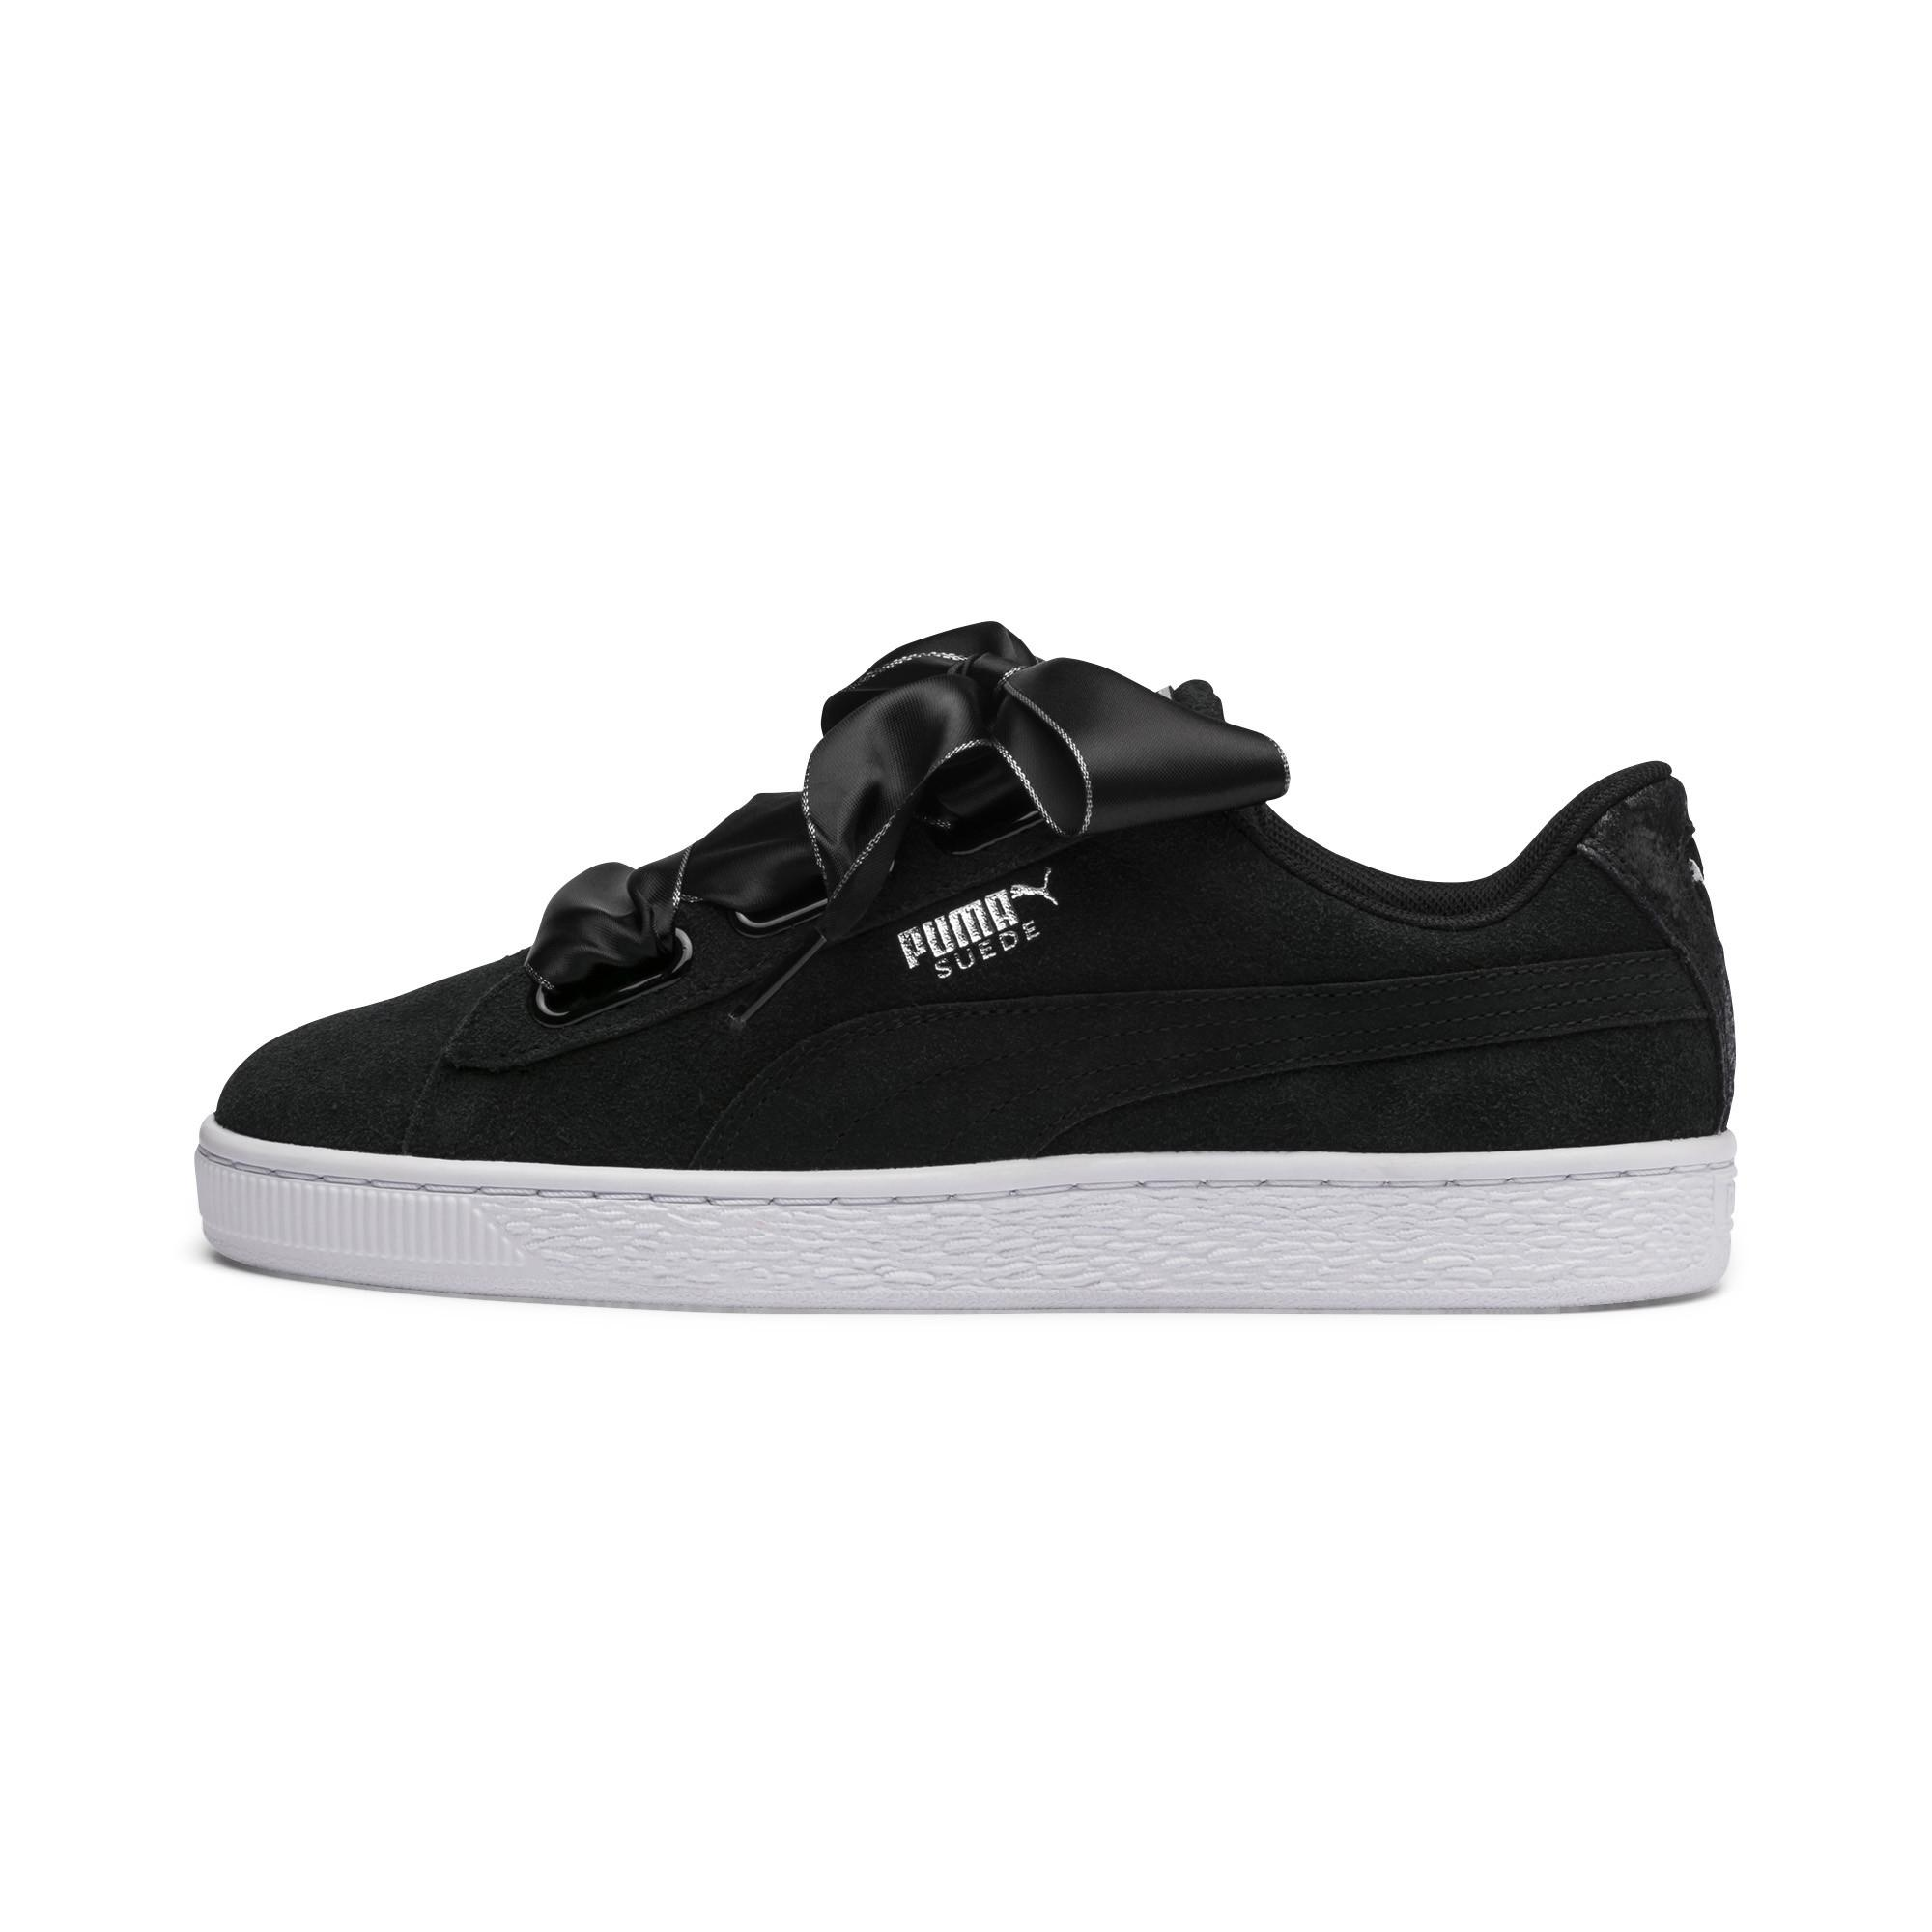 7a6e9df47fb5e8 Lyst - PUMA Suede Heart Galaxy  s Sneakers in Black